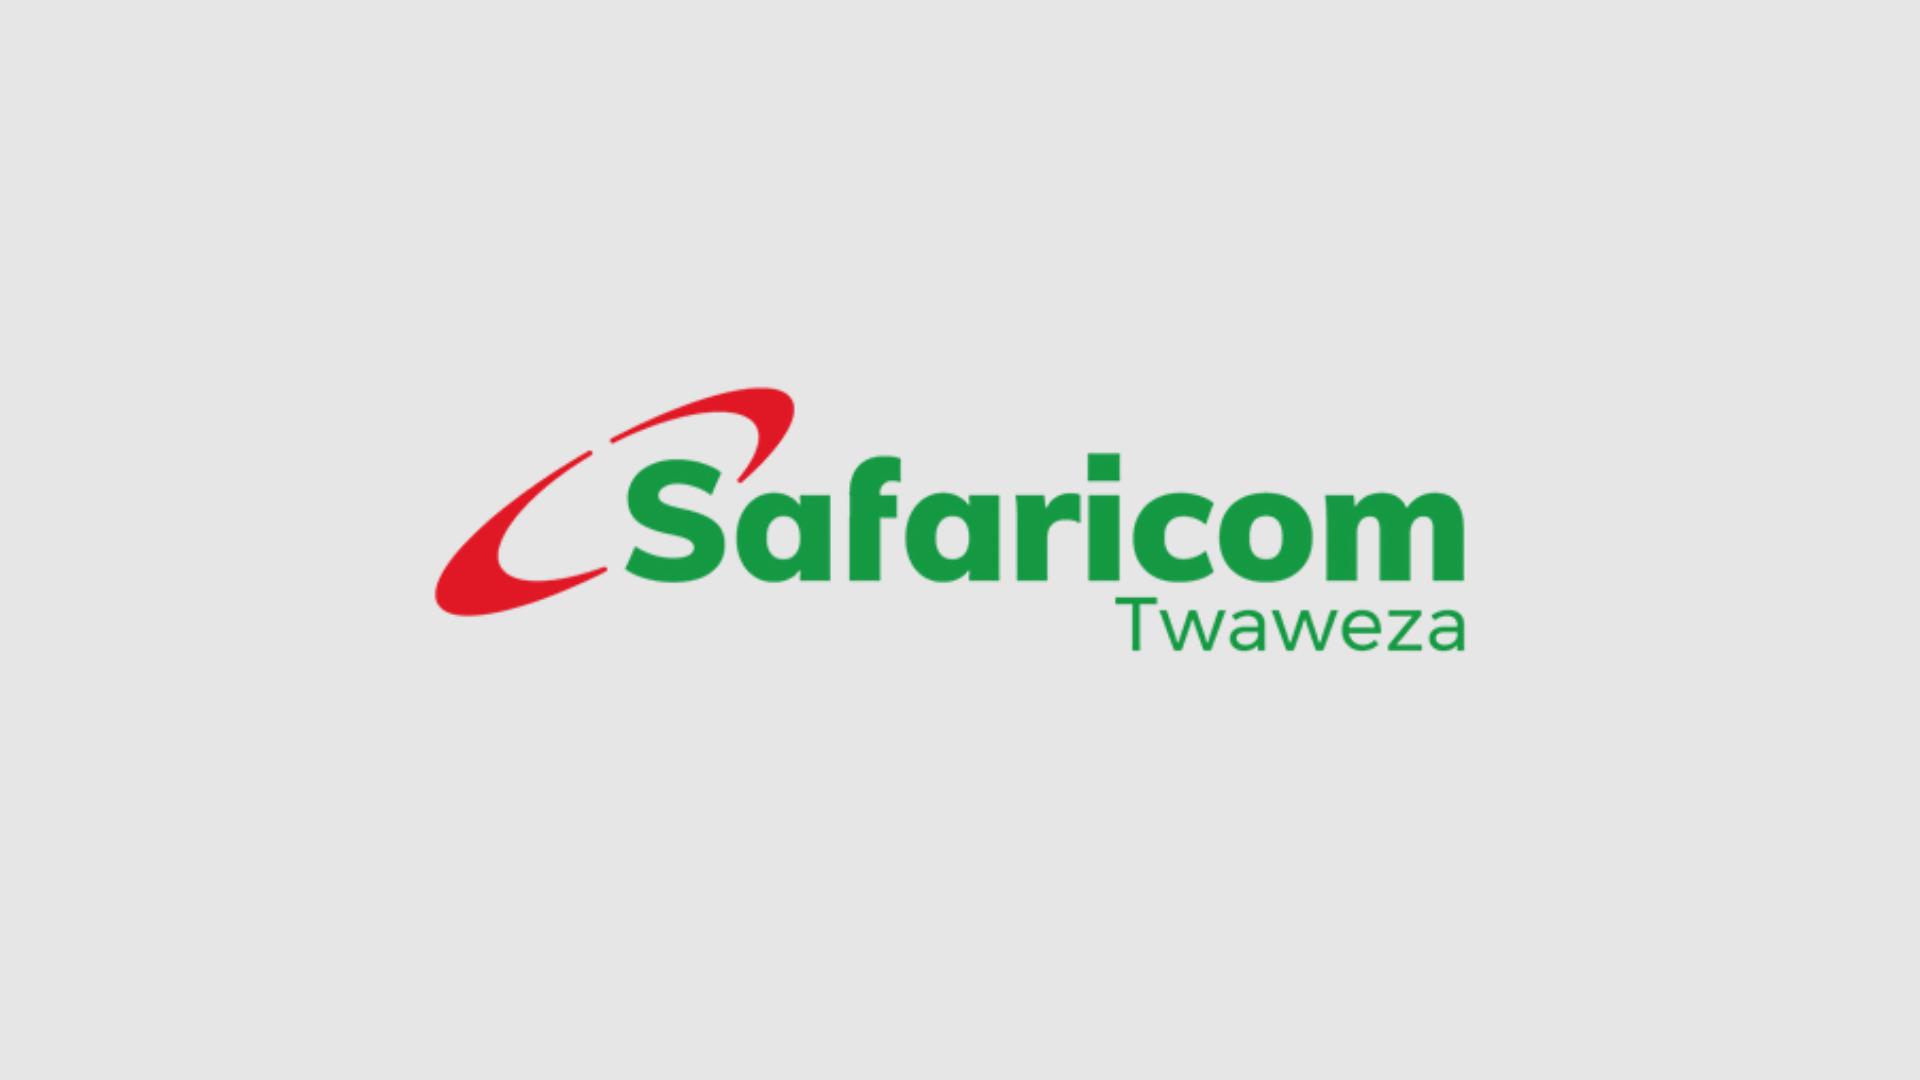 Safaricom Internet Service Providers In Kenya